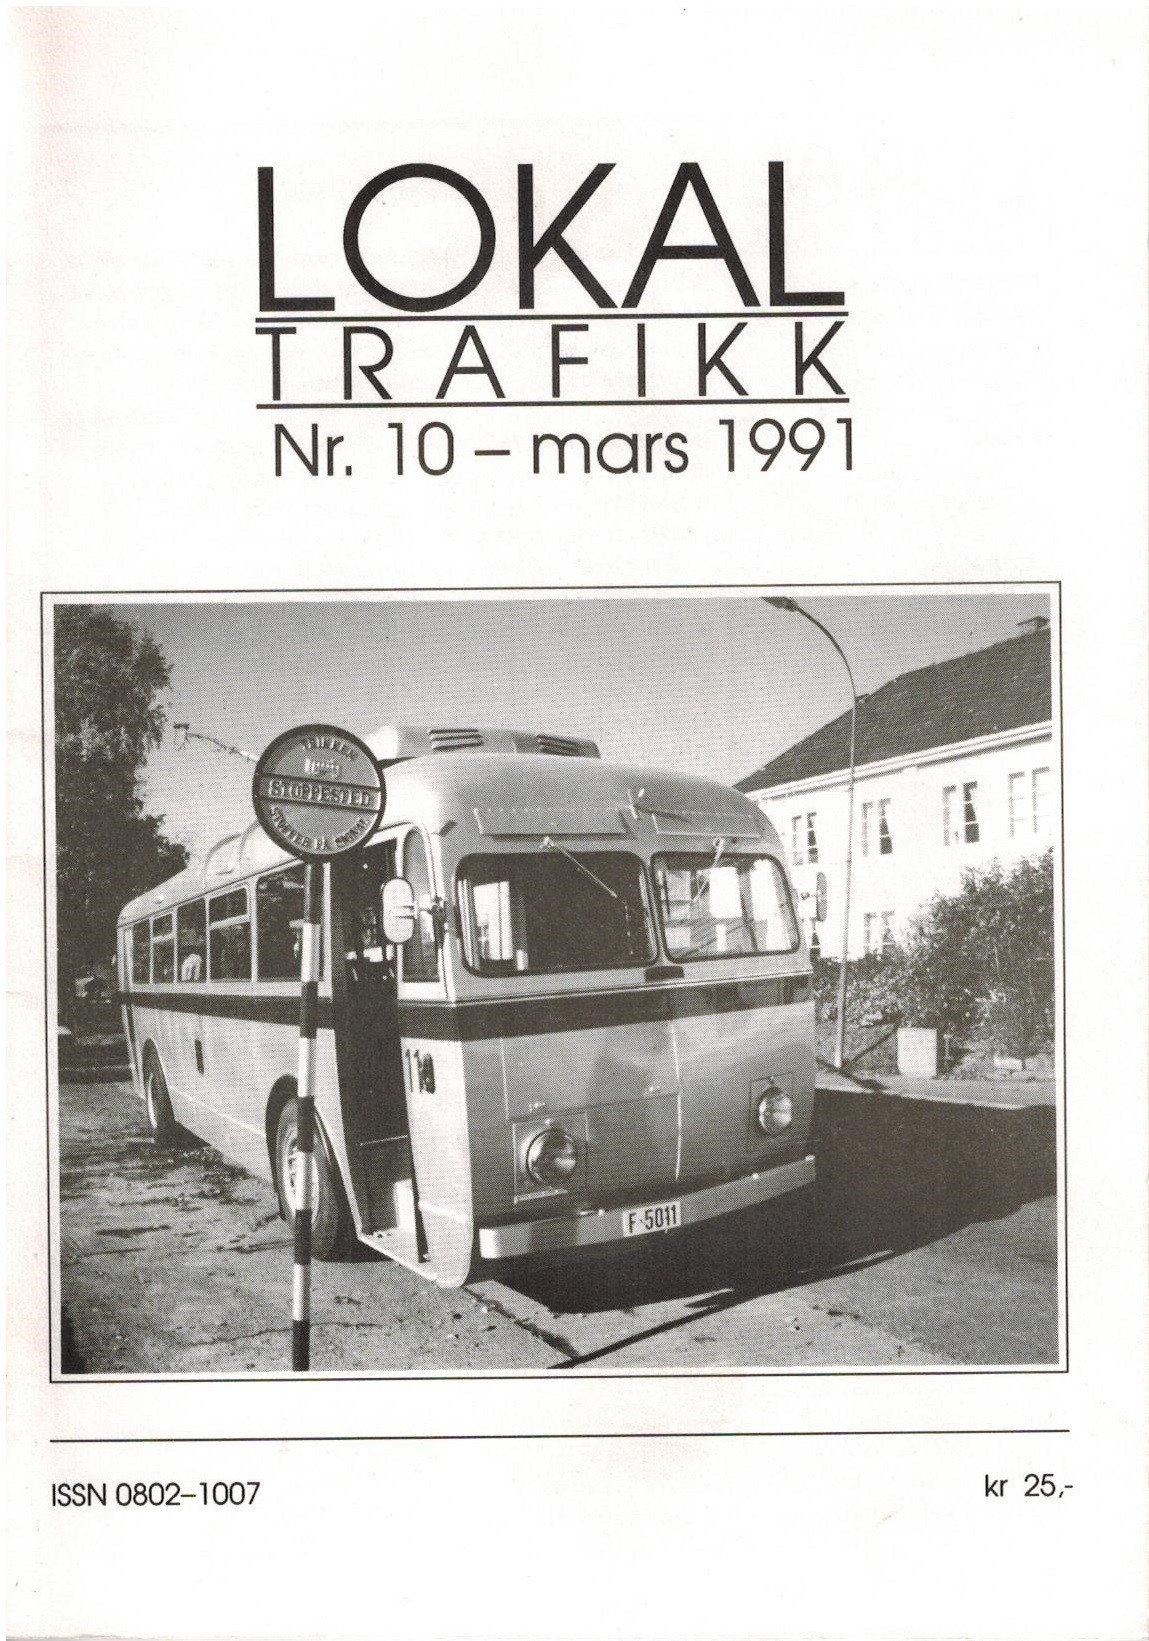 Lokaltrafikk #010